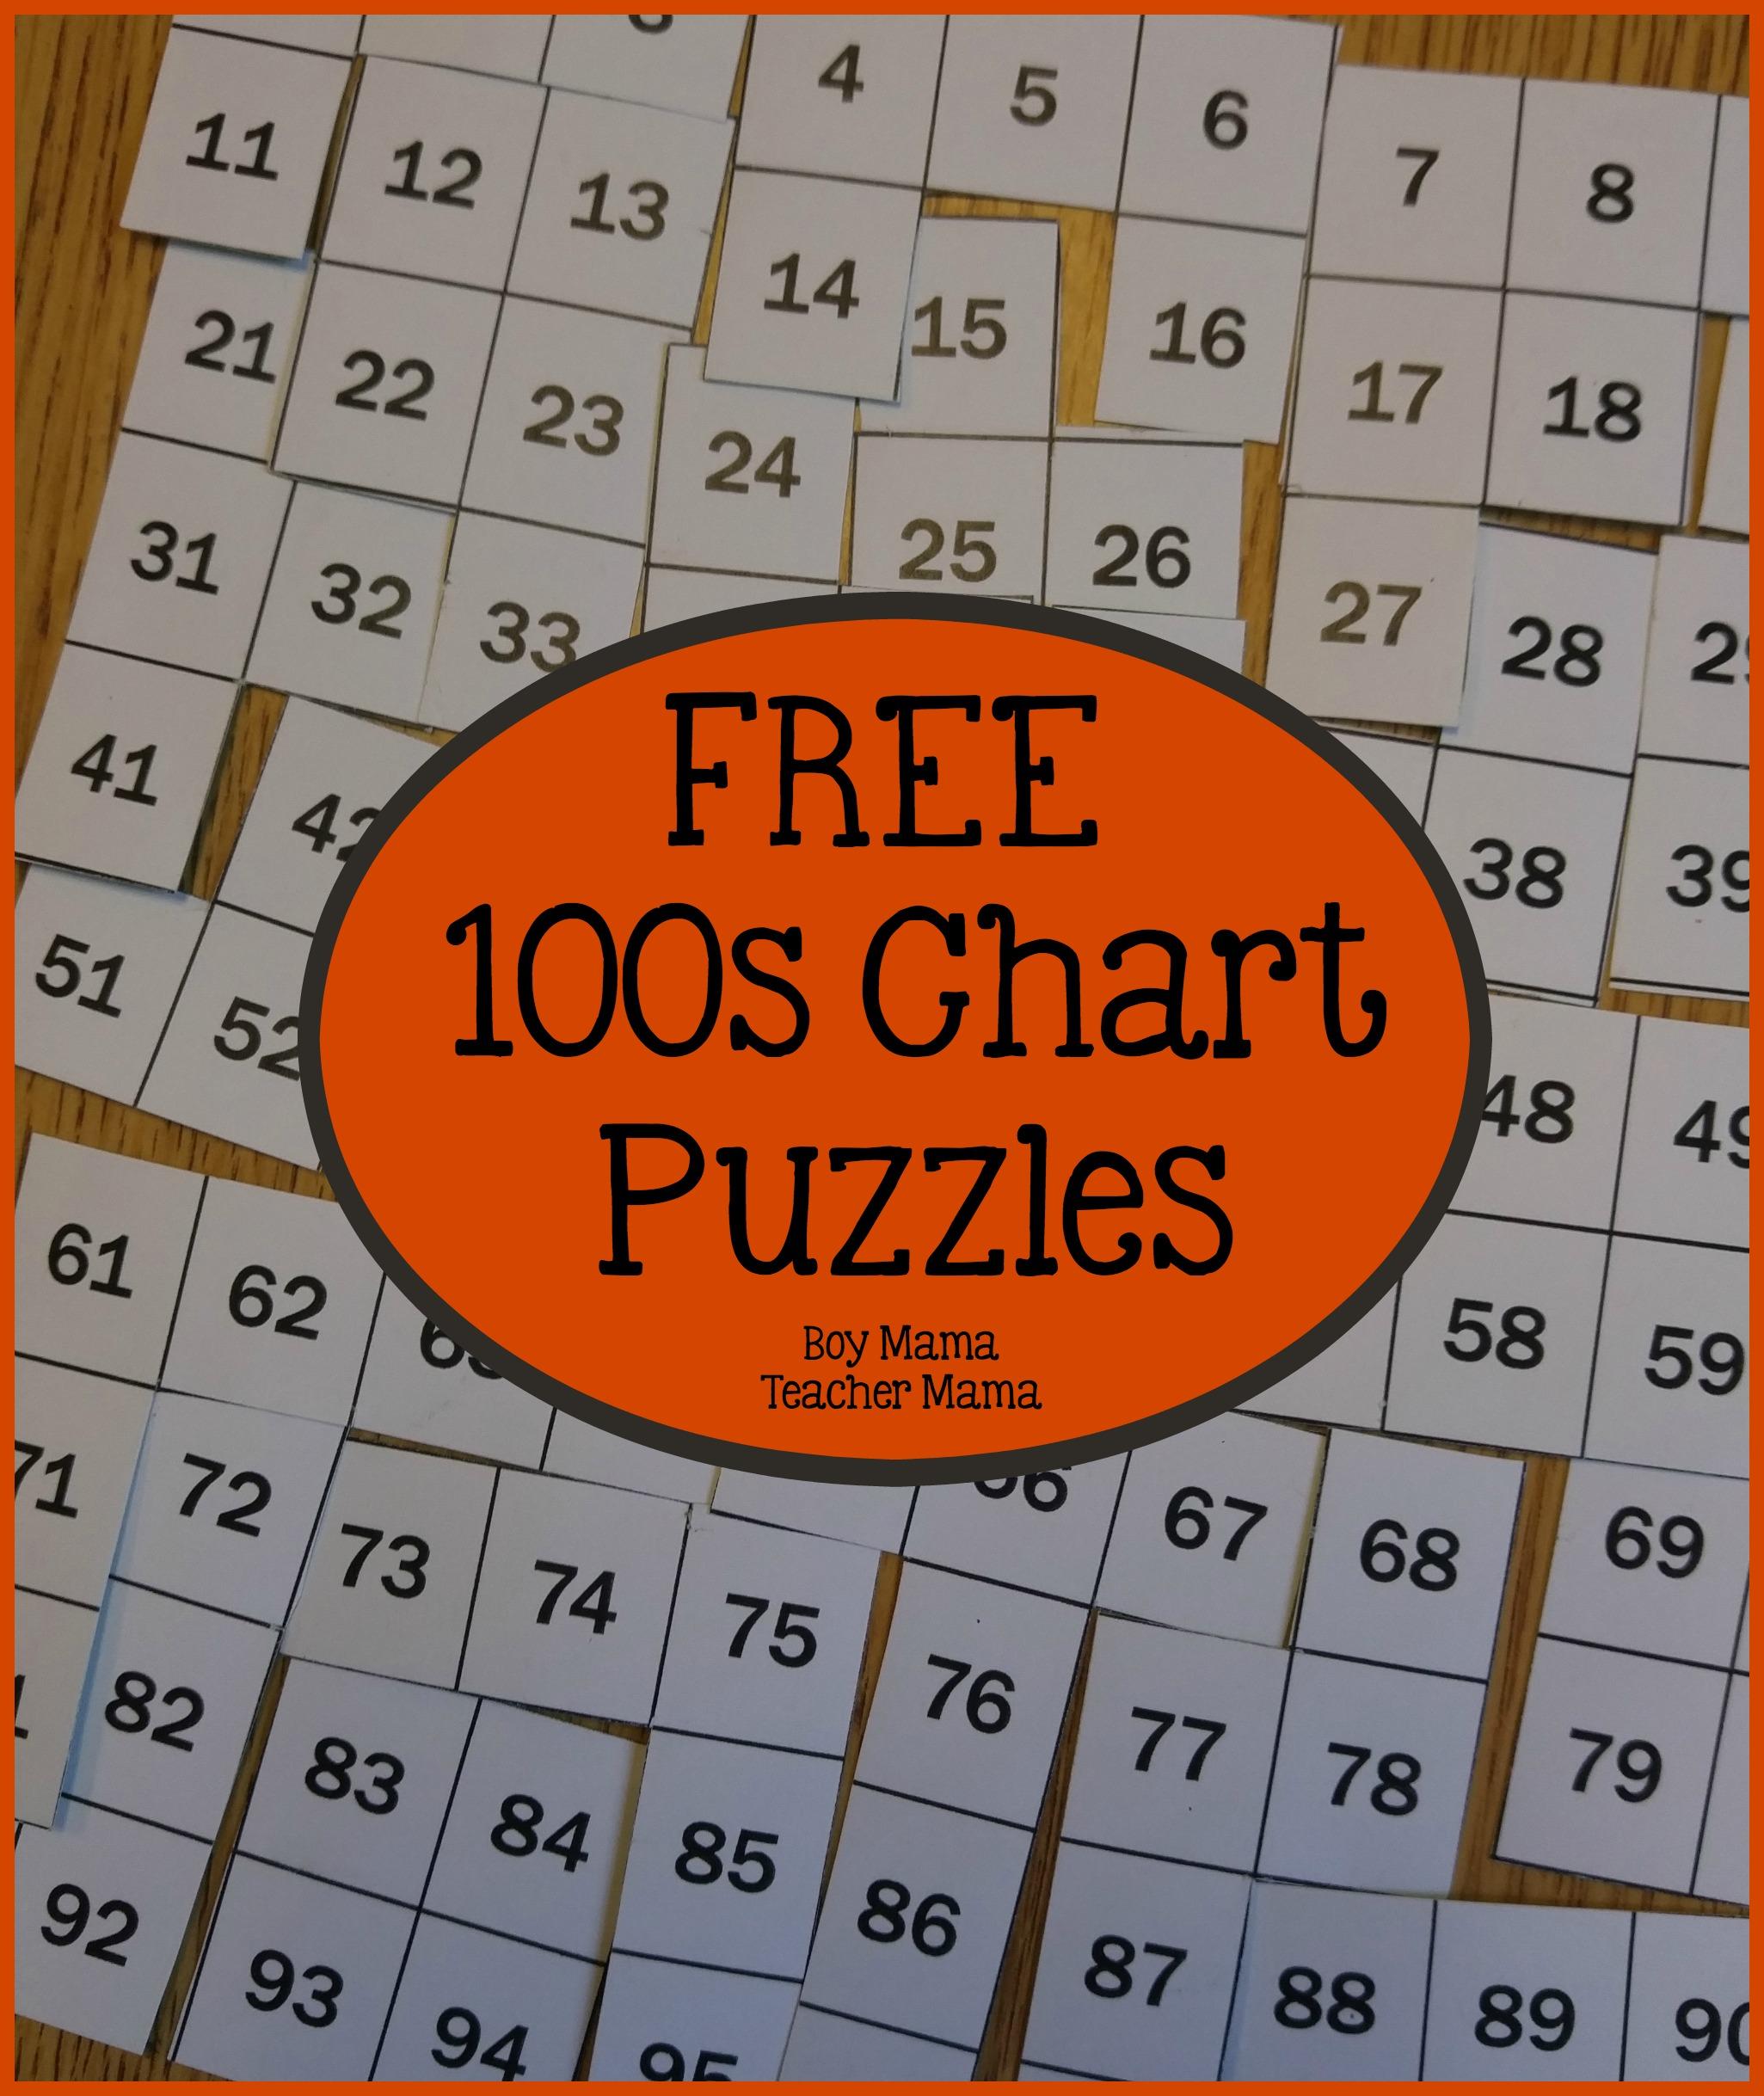 Boy Mama Teacher Mama 100s Chart Puzzles